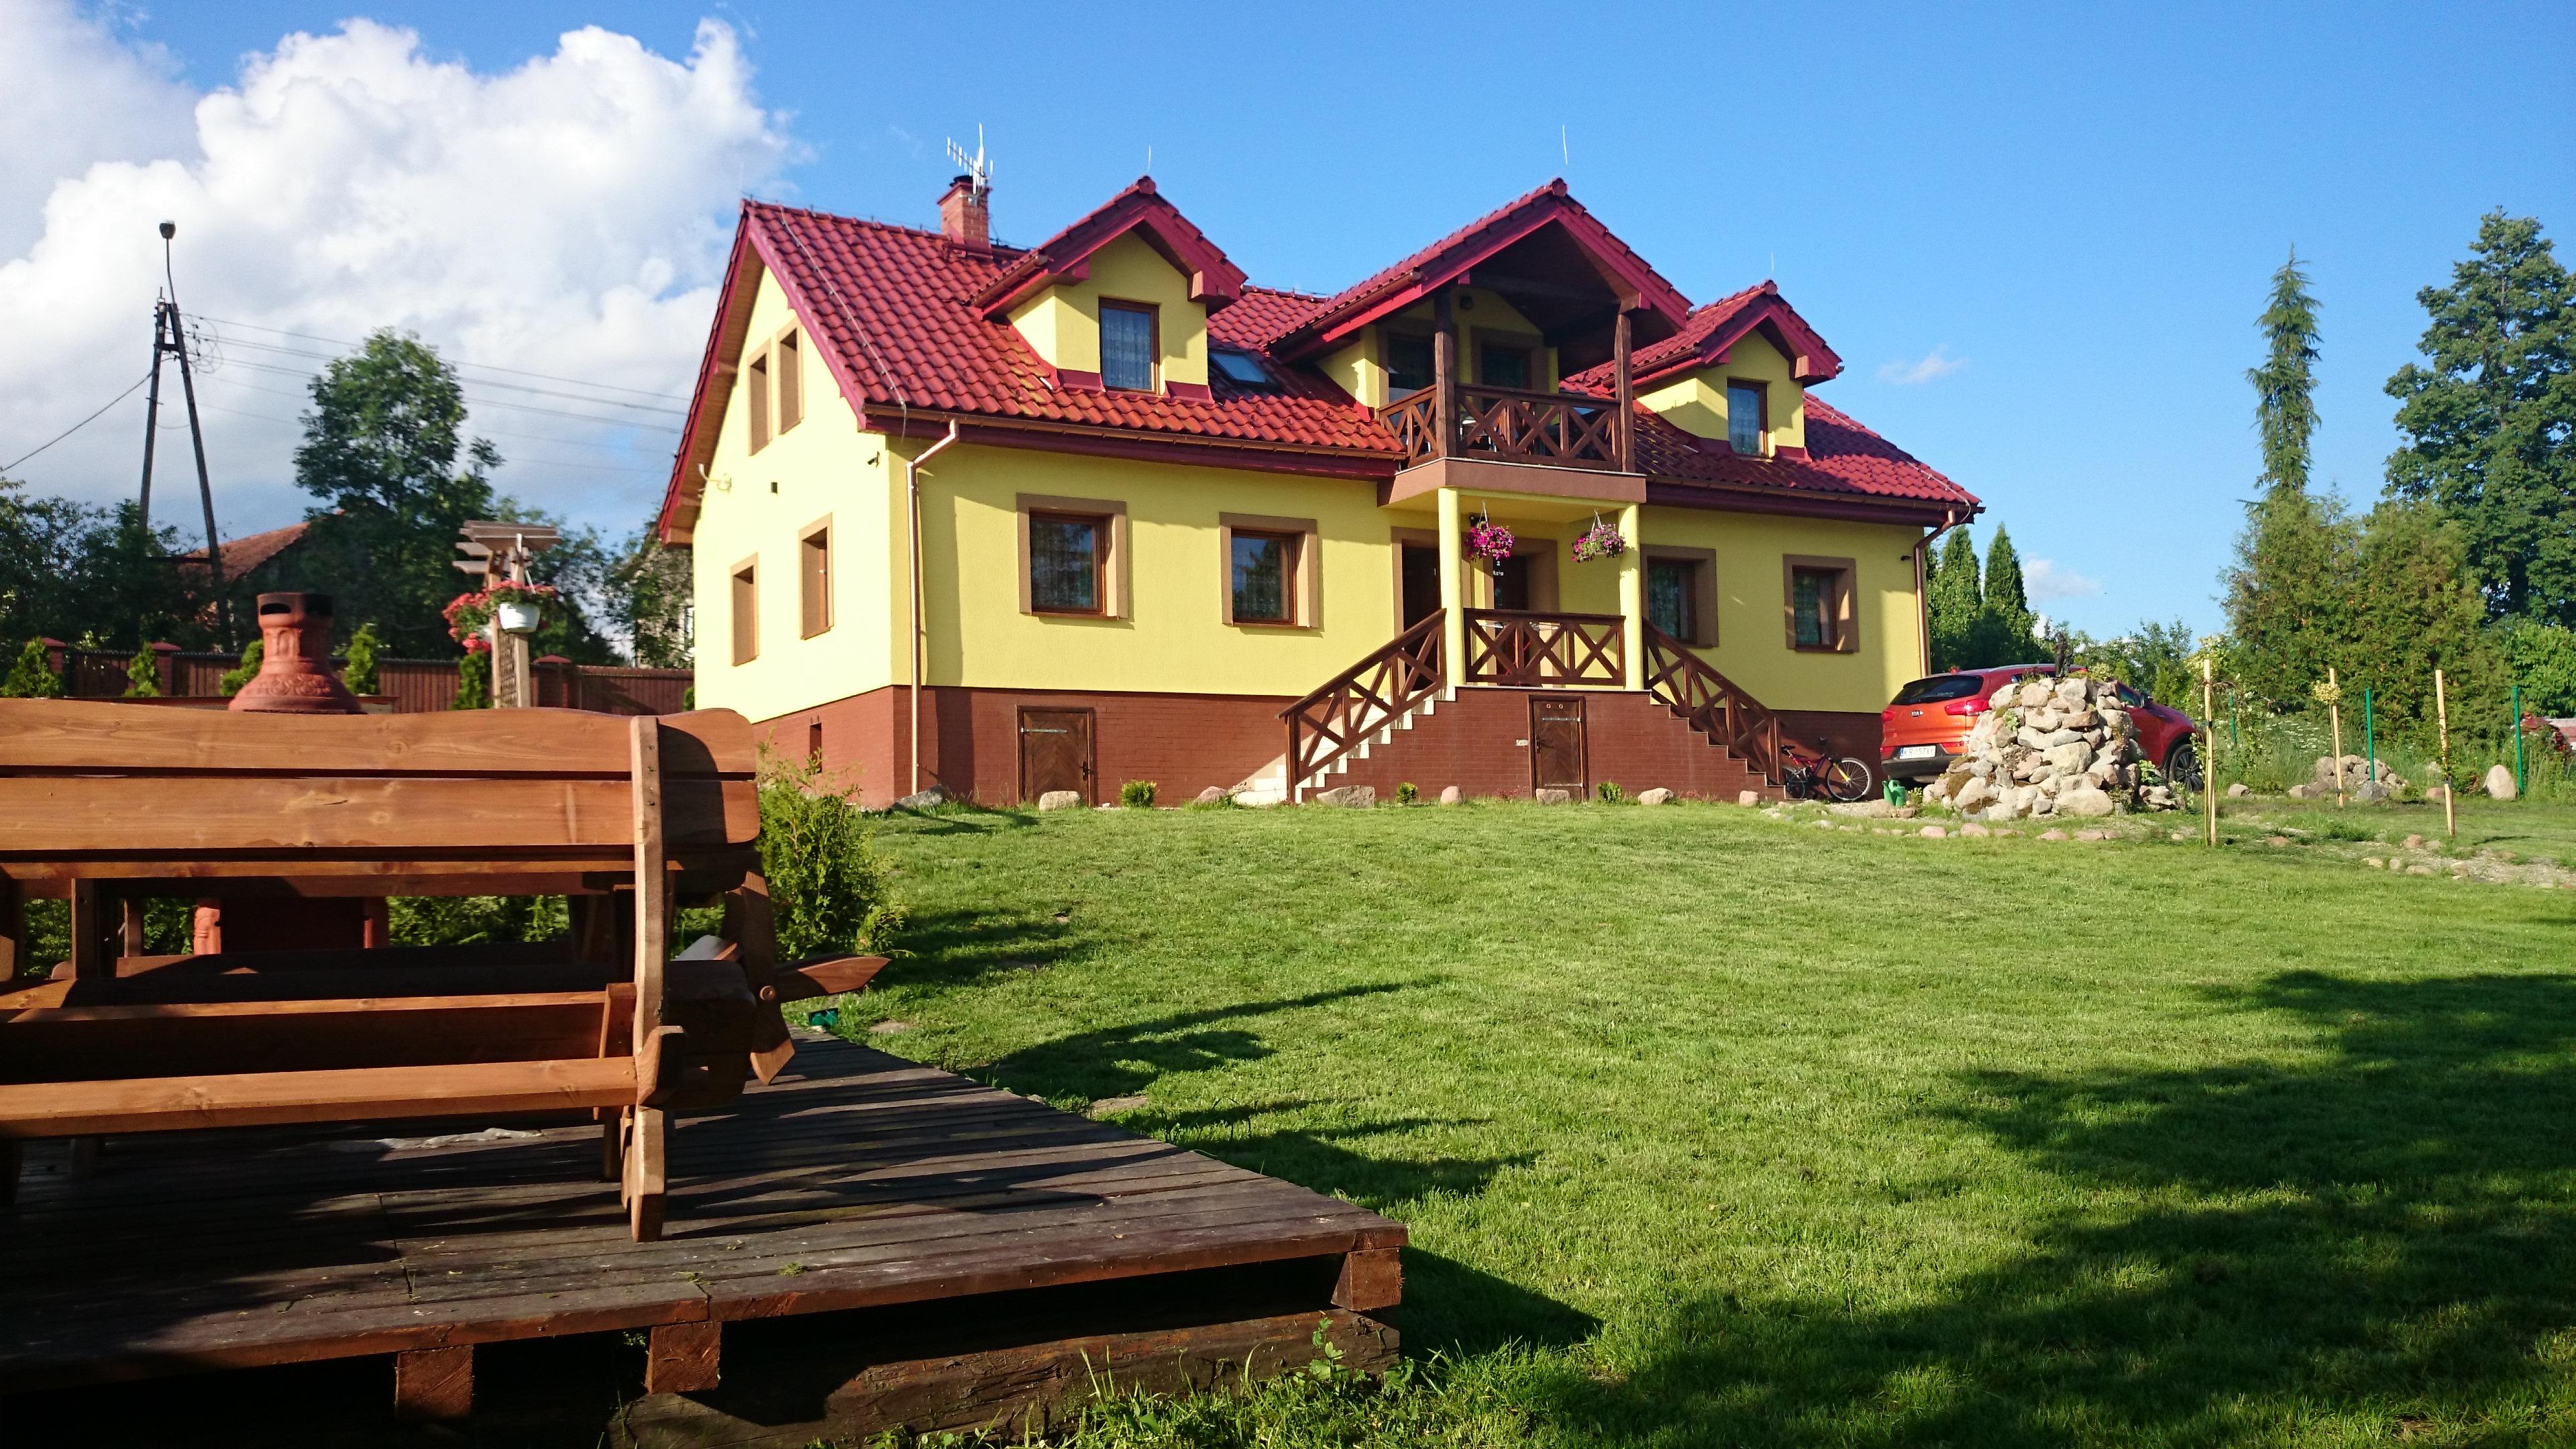 Mazurski Raj - opis domu i posesji